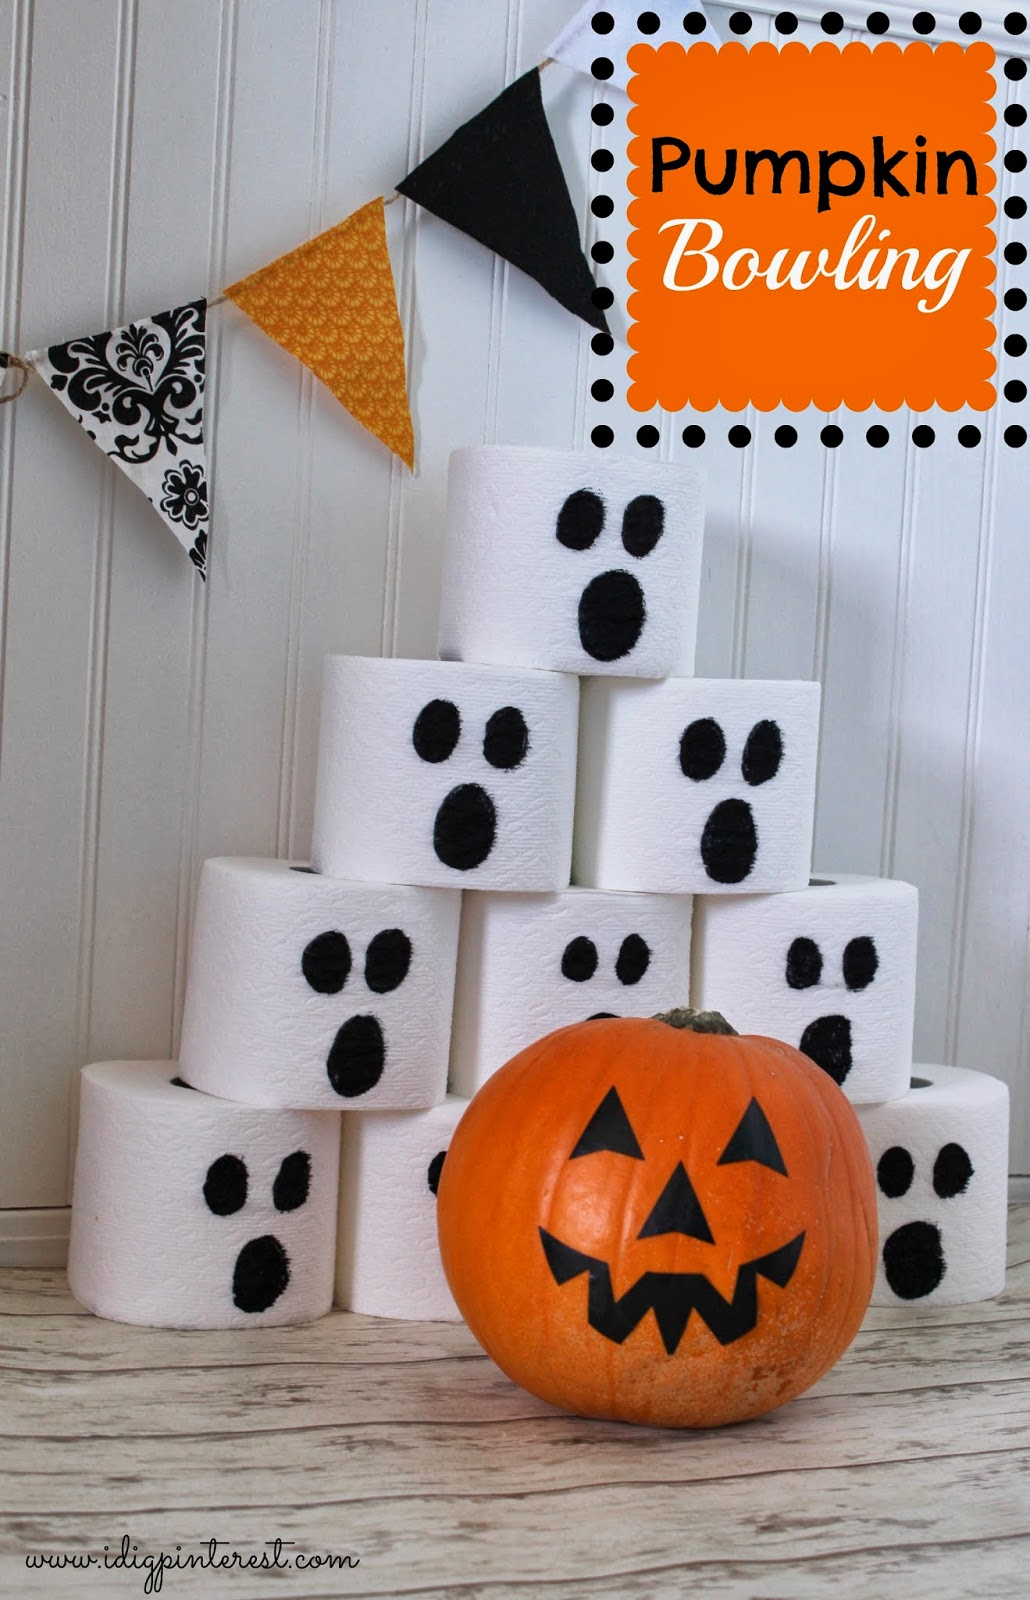 Pumpkin Bowling Halloween Party Game - I Dig Pinterest